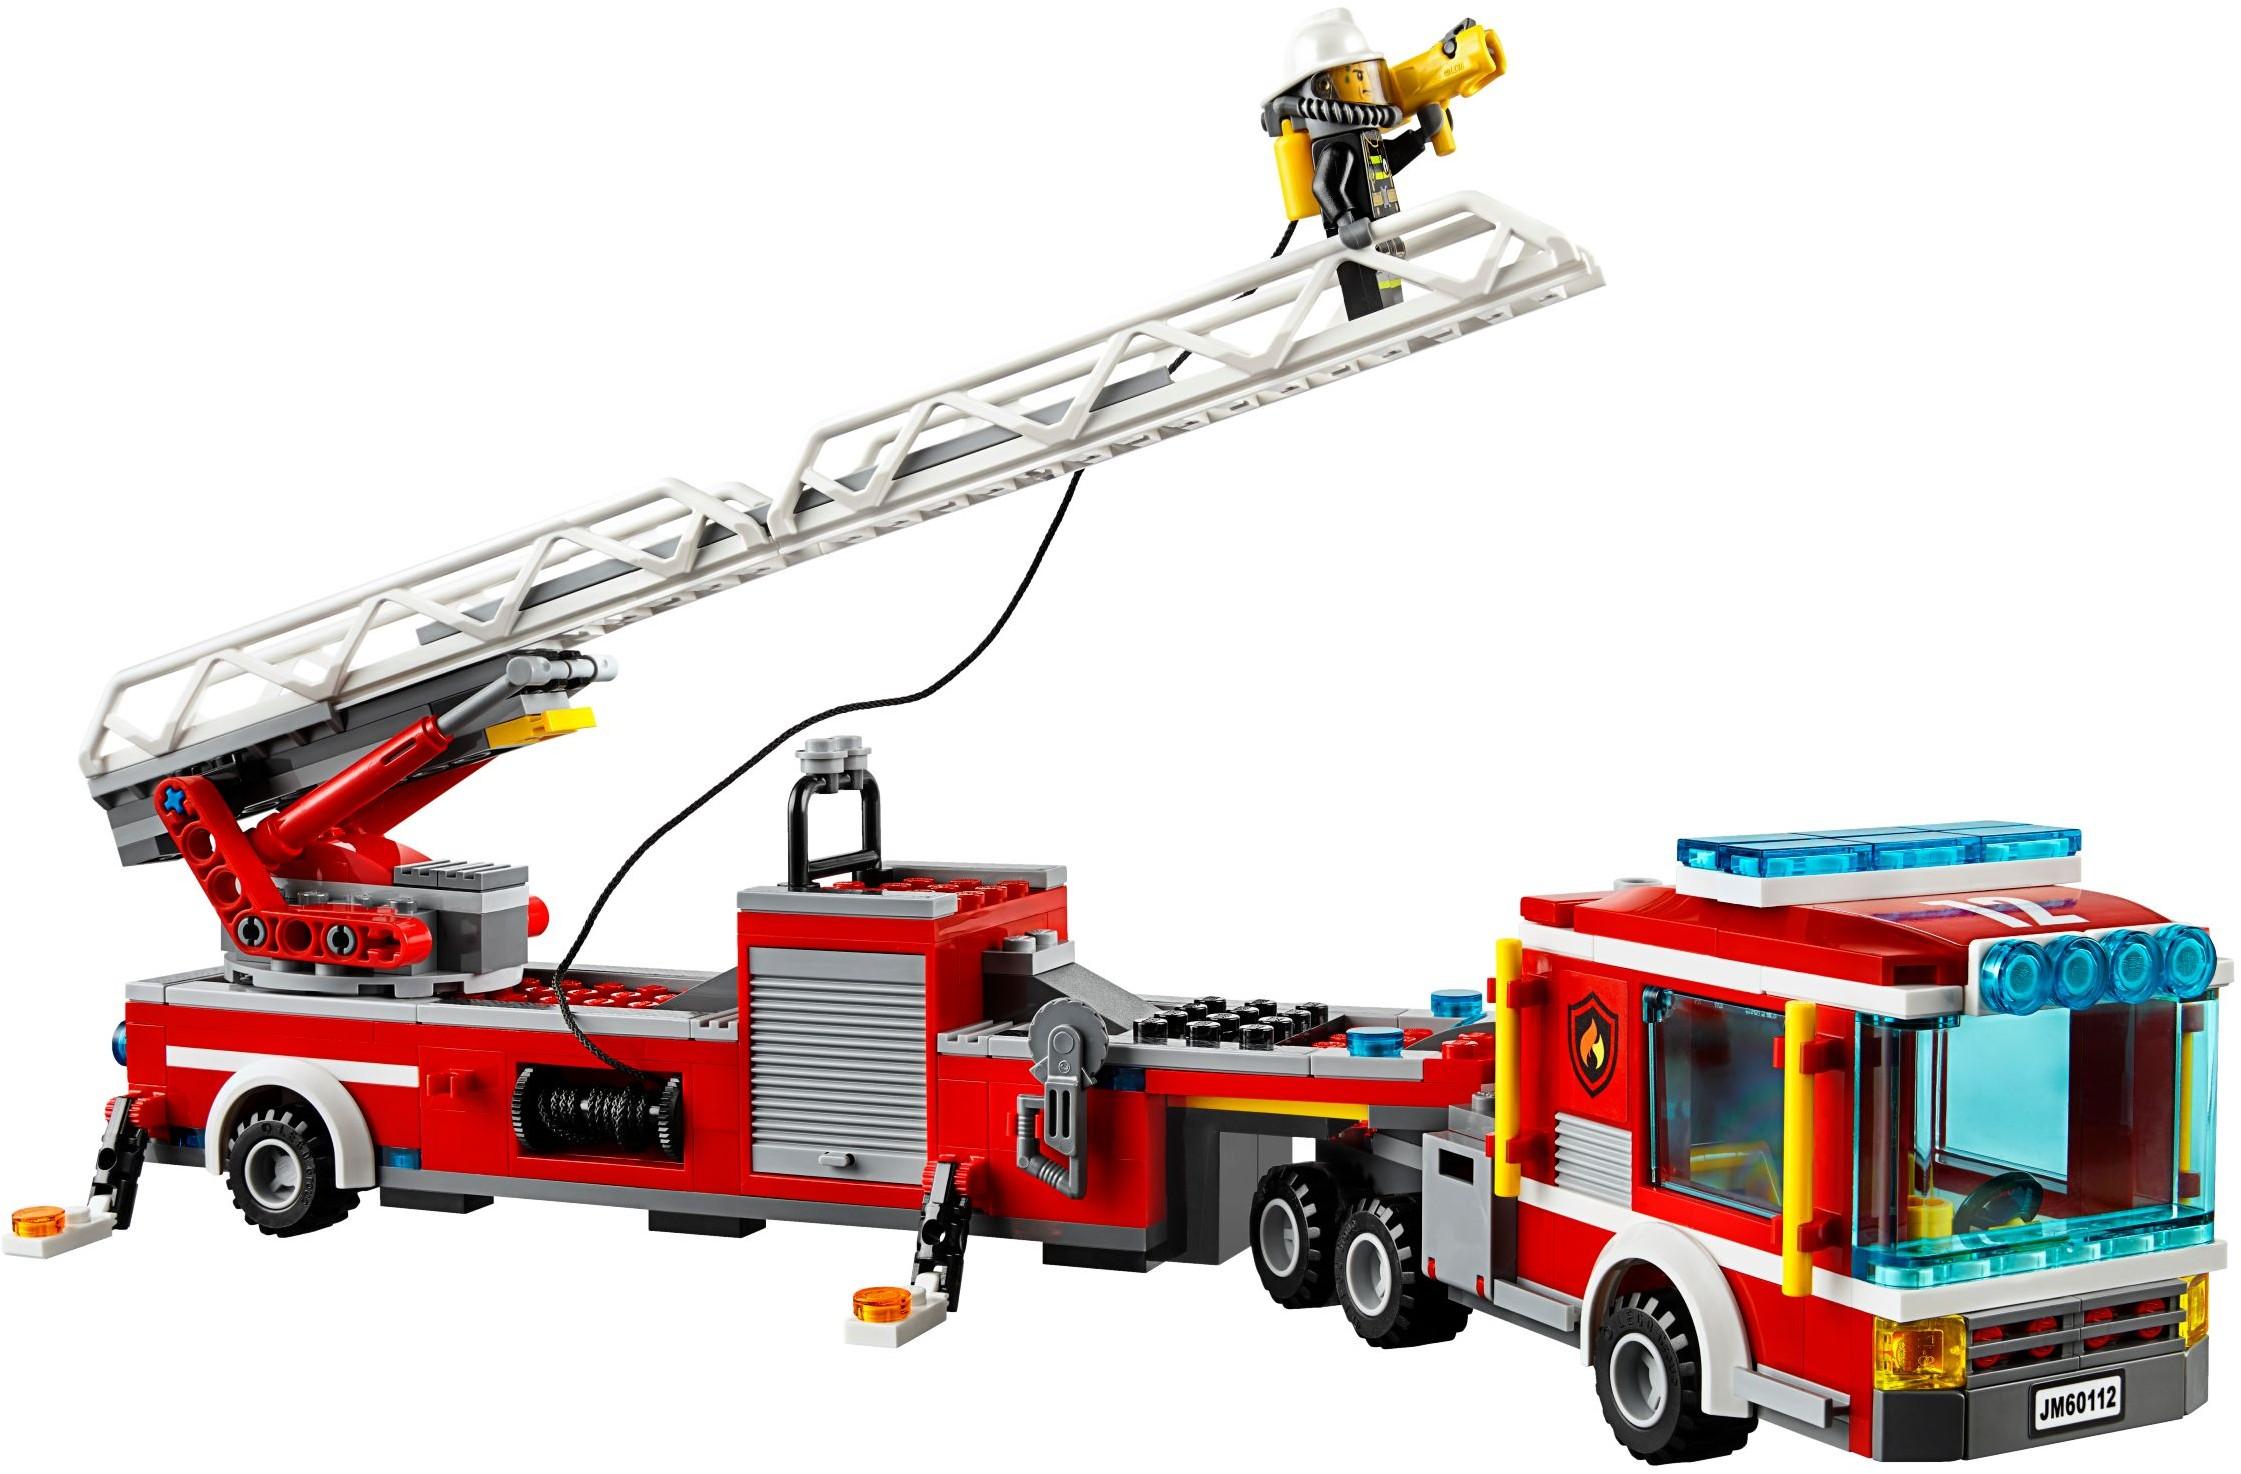 Lego 60112 Fire Engine